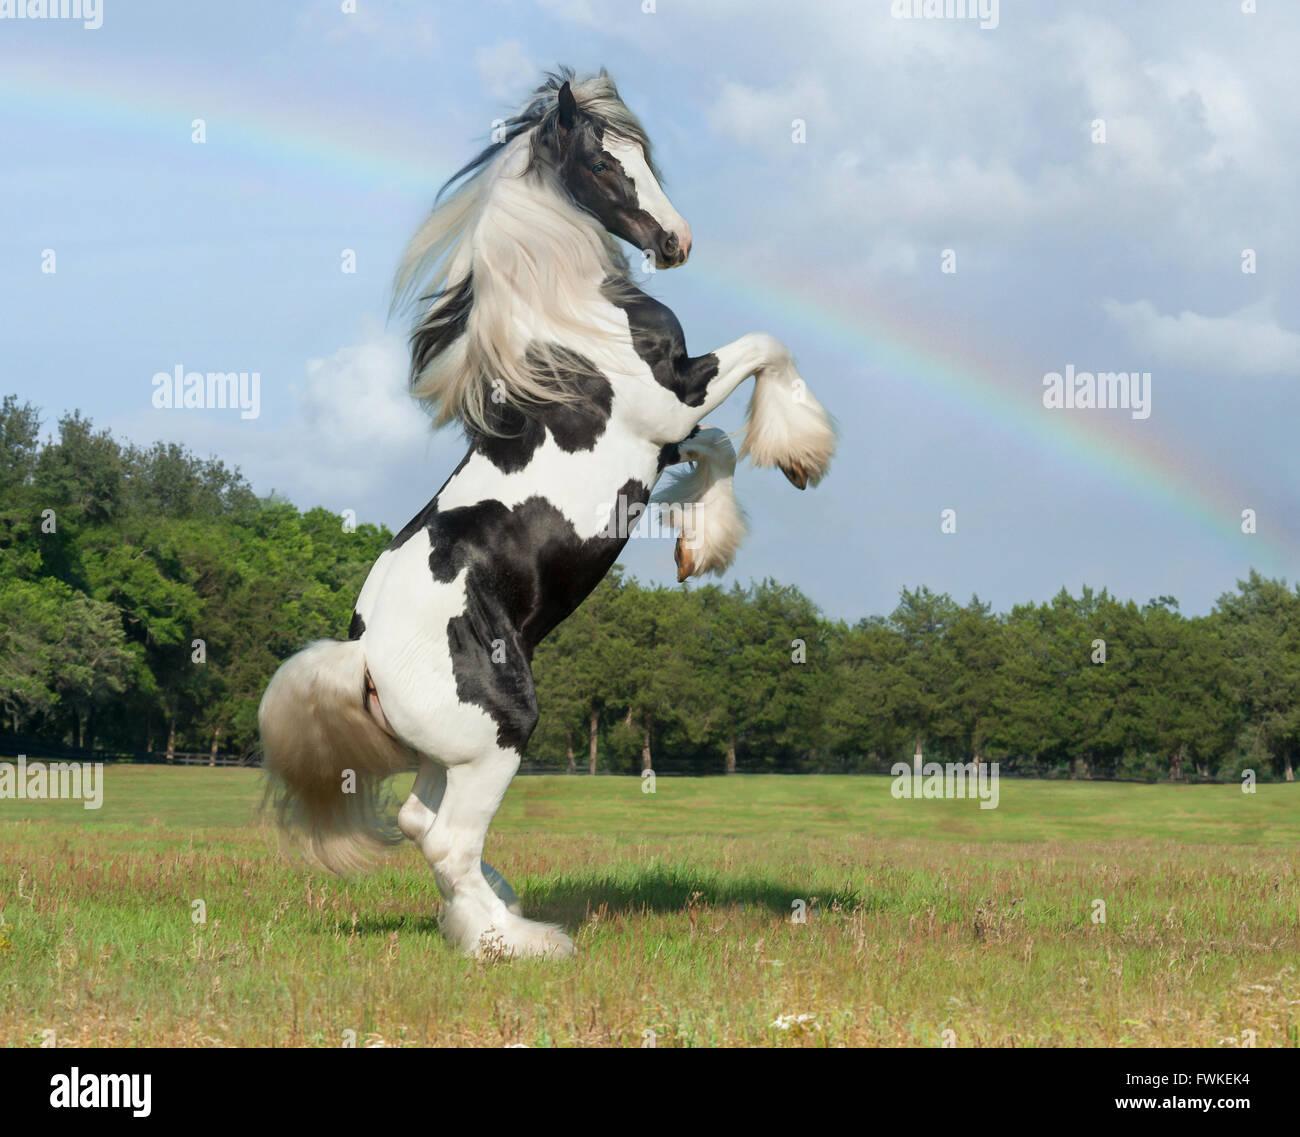 Gypsy Vanner Horse stallion Photo Stock